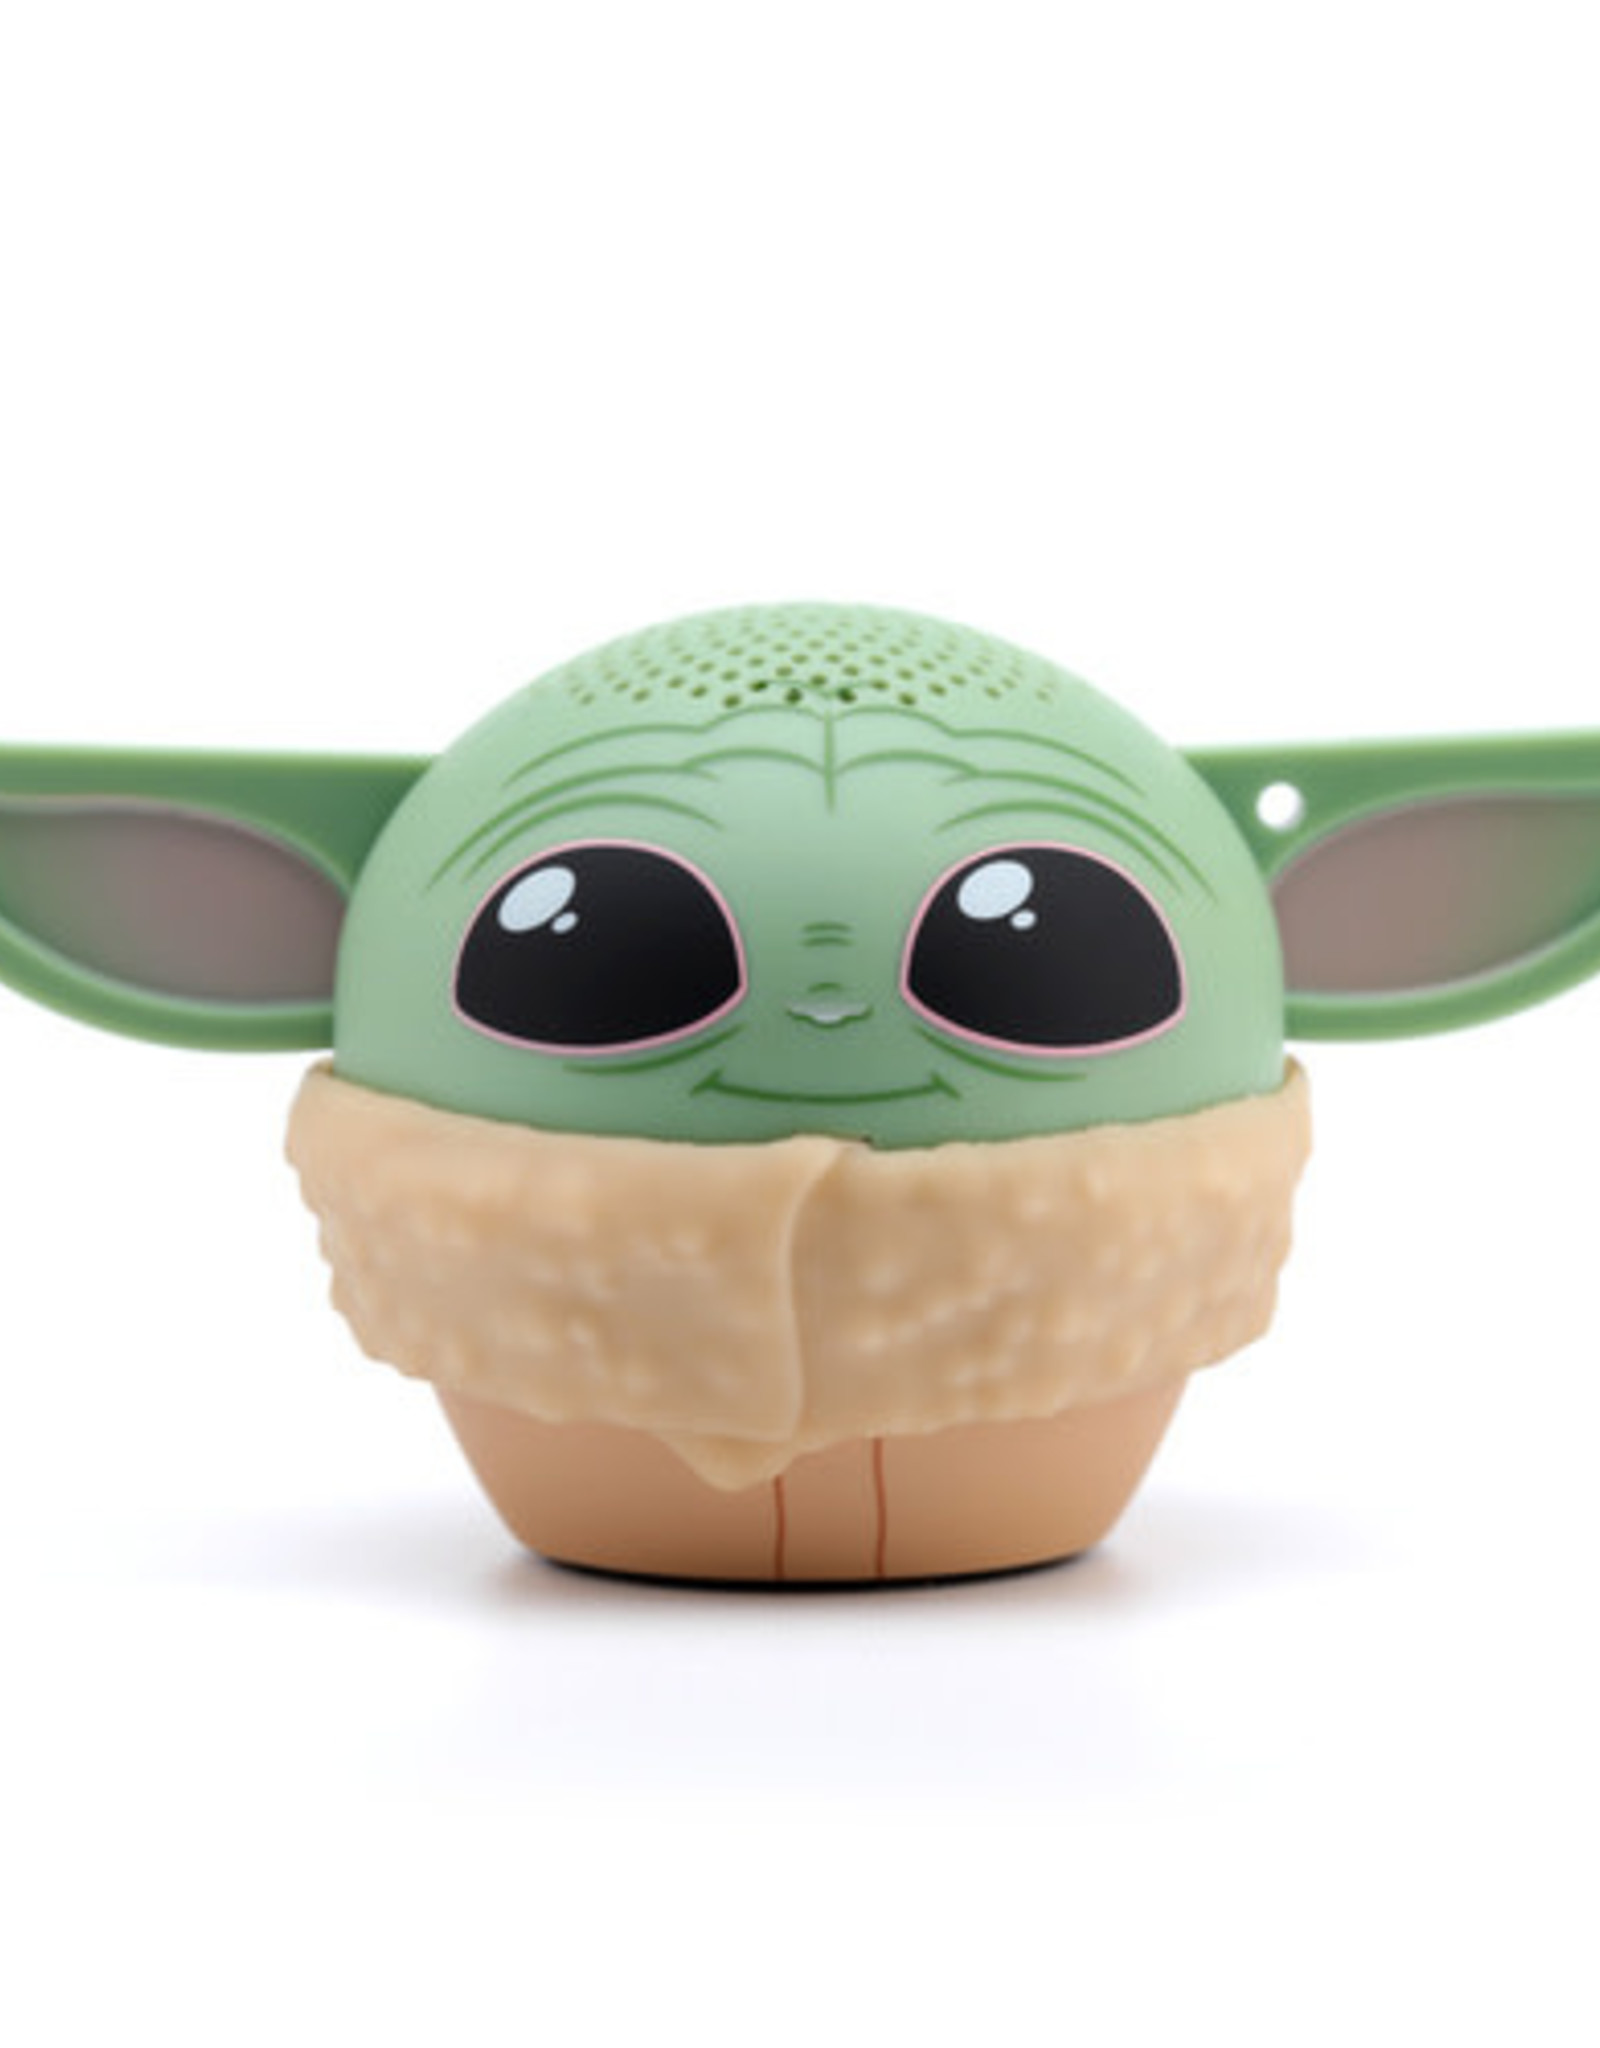 Star Wars Grogu/Baby Yoda Bluetooth Speaker